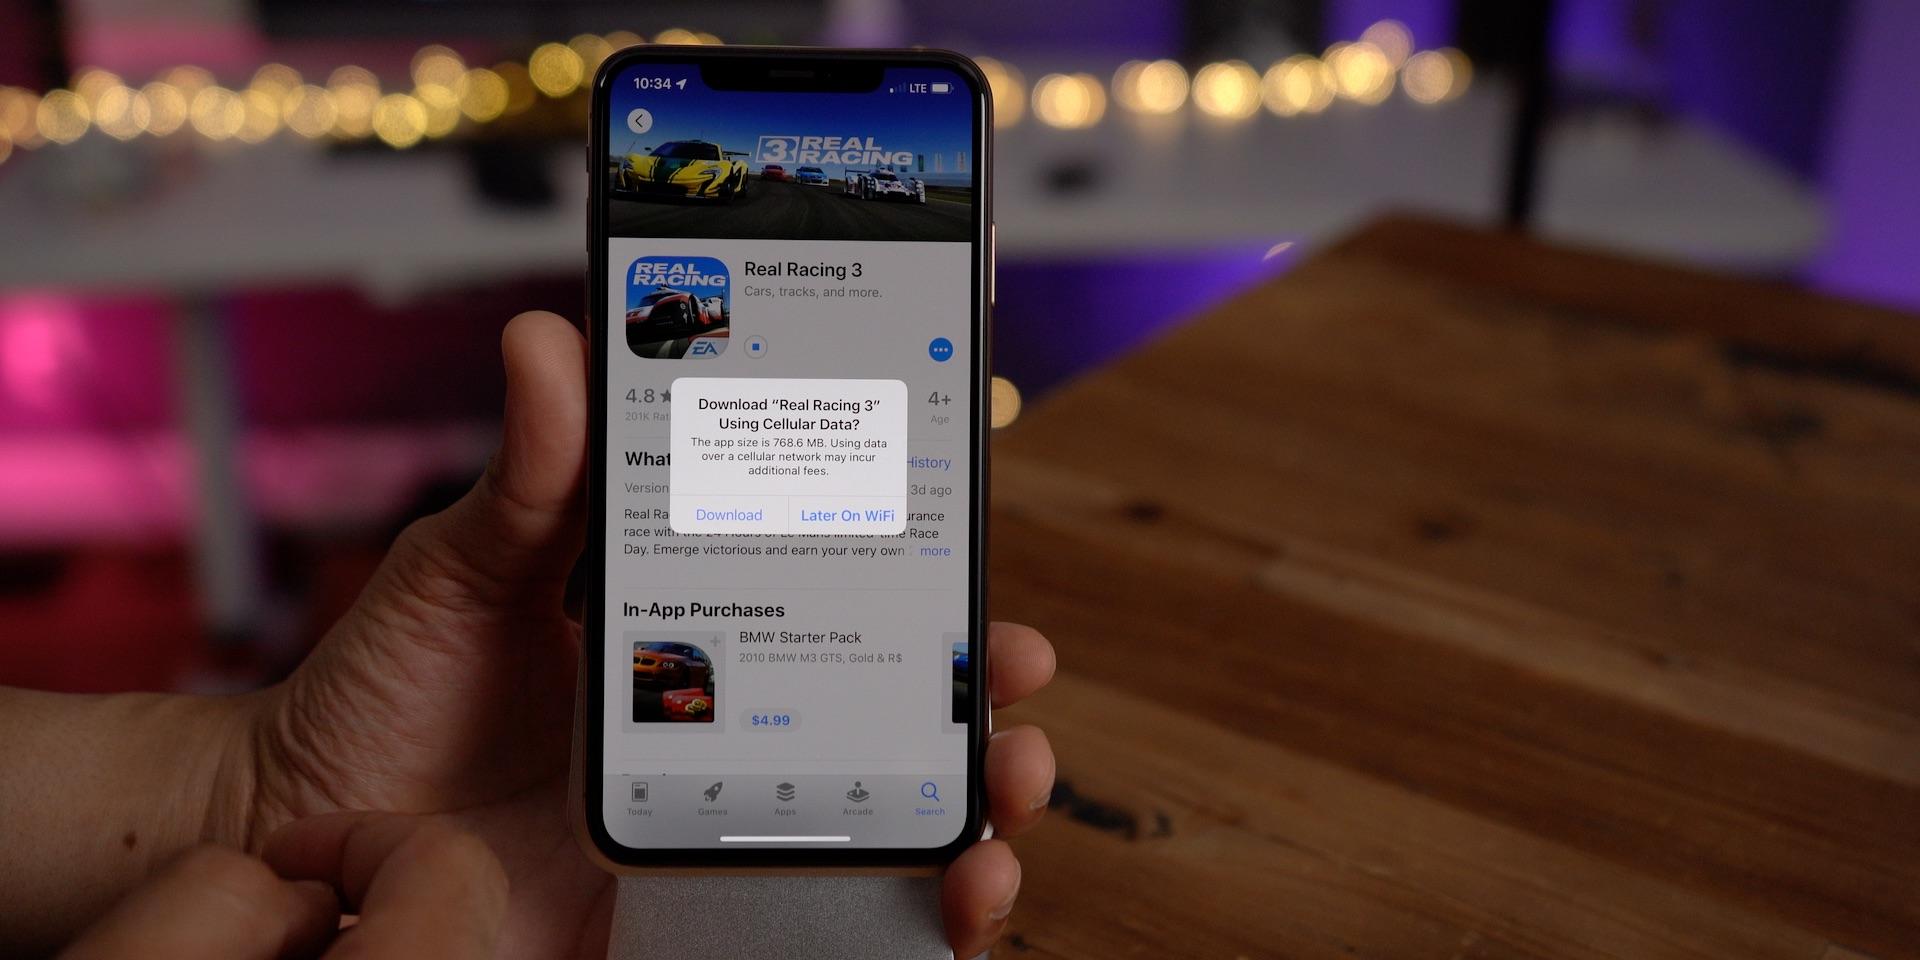 iOS 13 changes cellular download limit